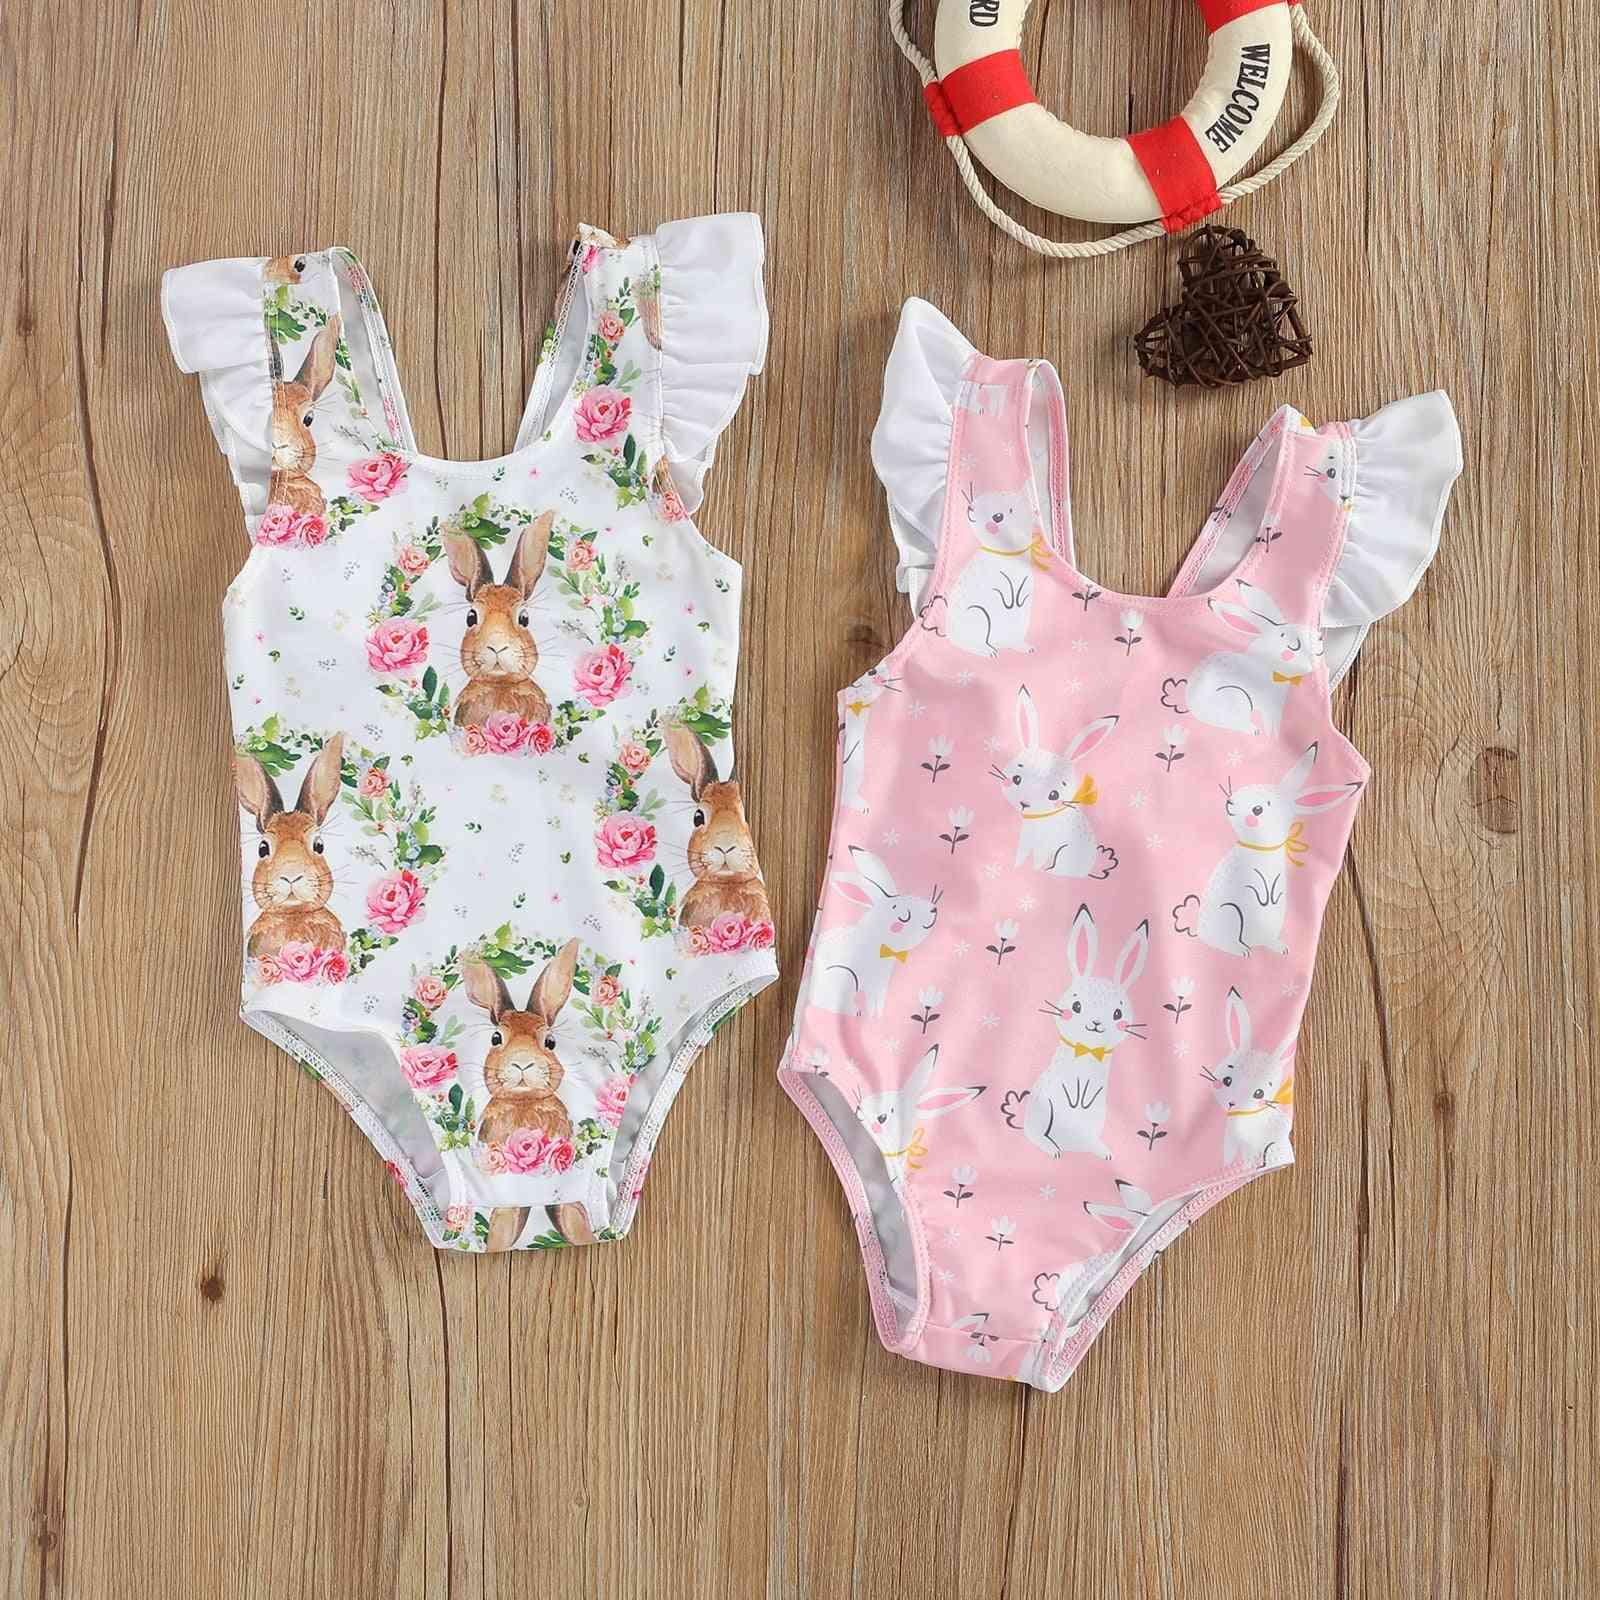 Breathable Little Girl One-piece Swimsuit, Cute Rabbit Flower Flying Sleeve Swimsuit